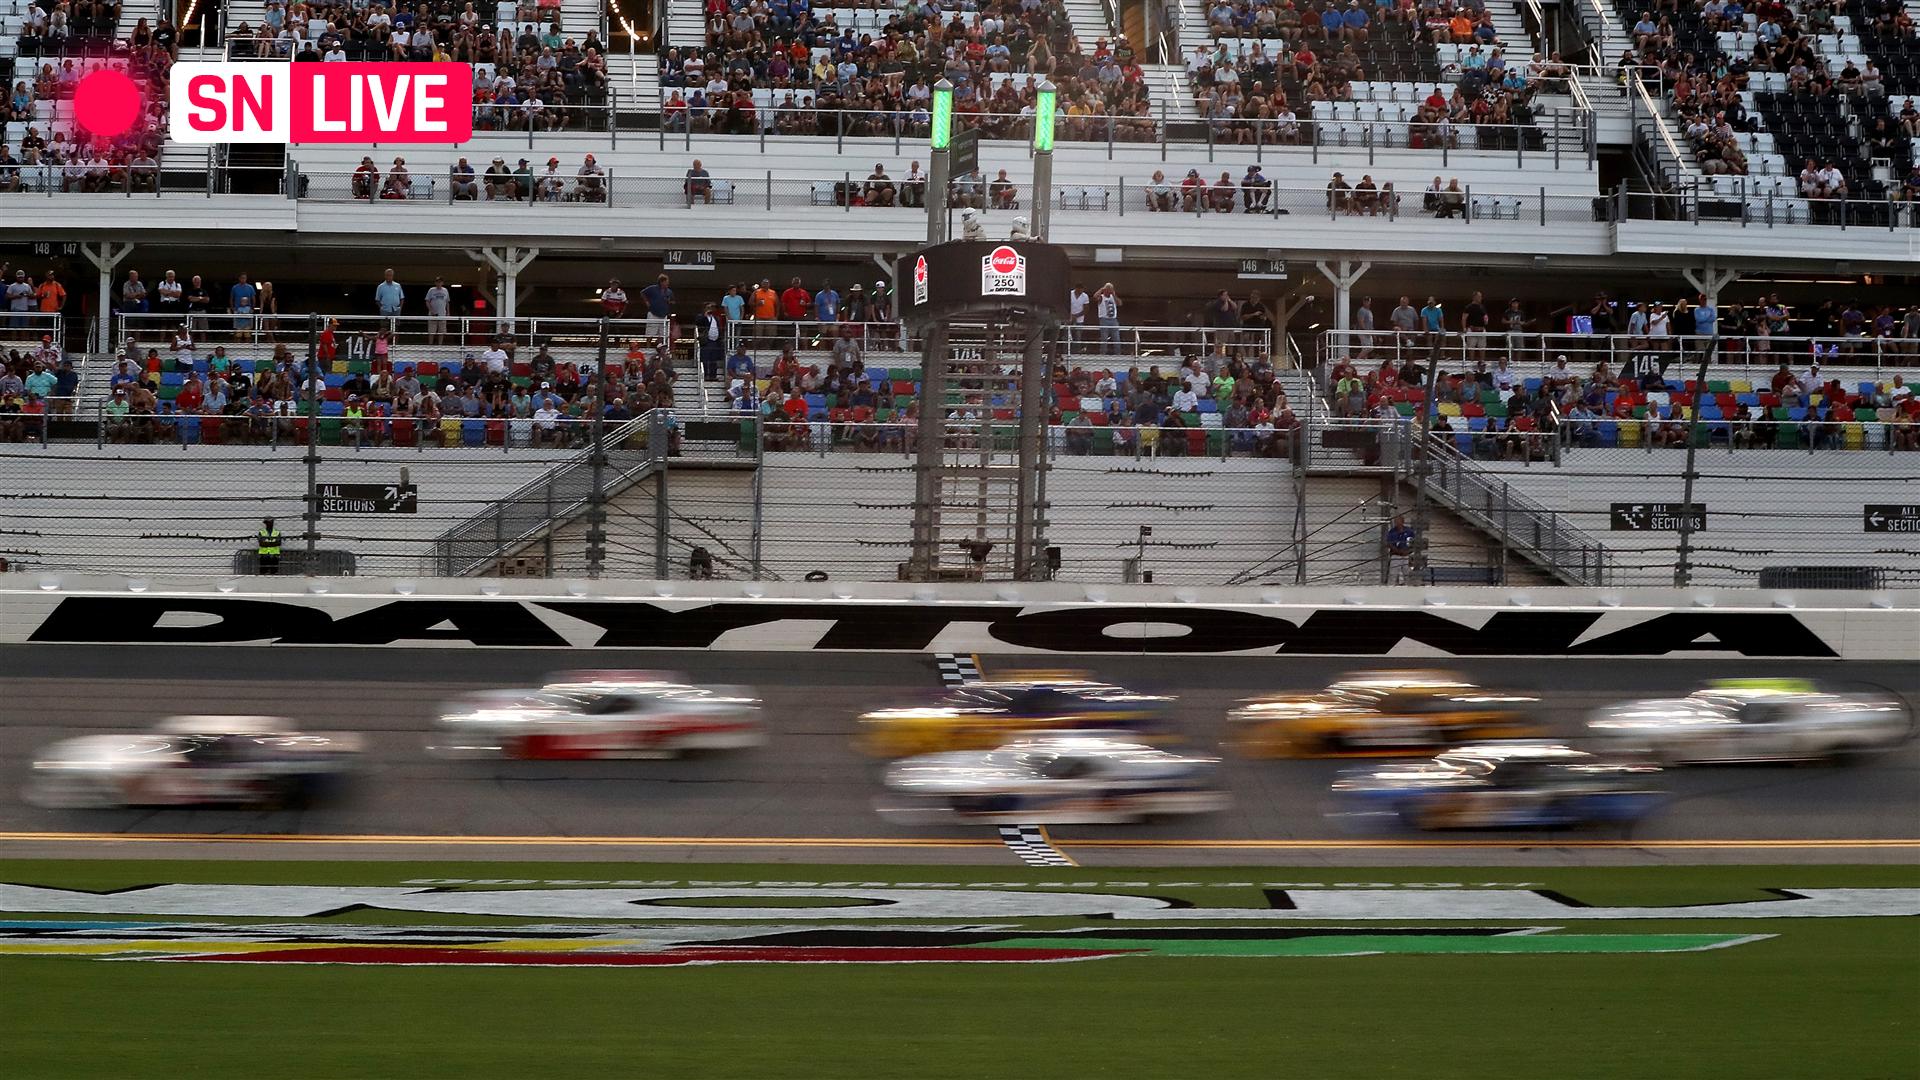 Daytona 500 starting lineup: Qualifying results, pole winner, driver entry list